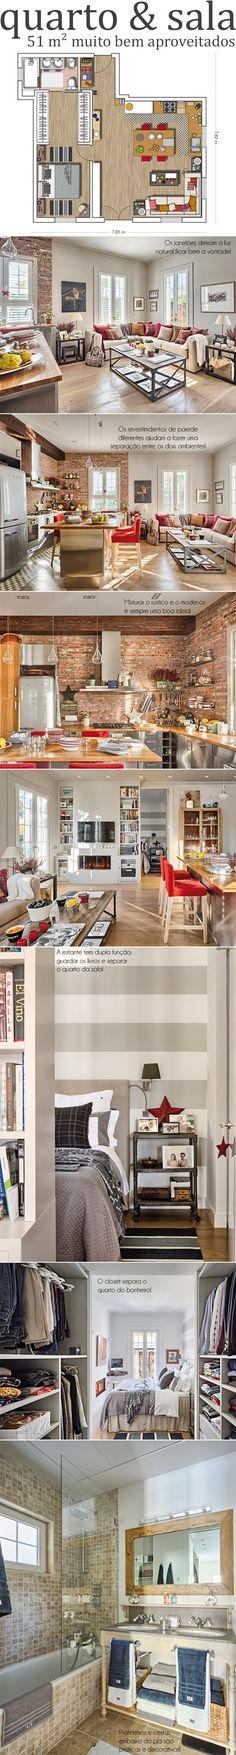 Quarto & sala, 51 m²